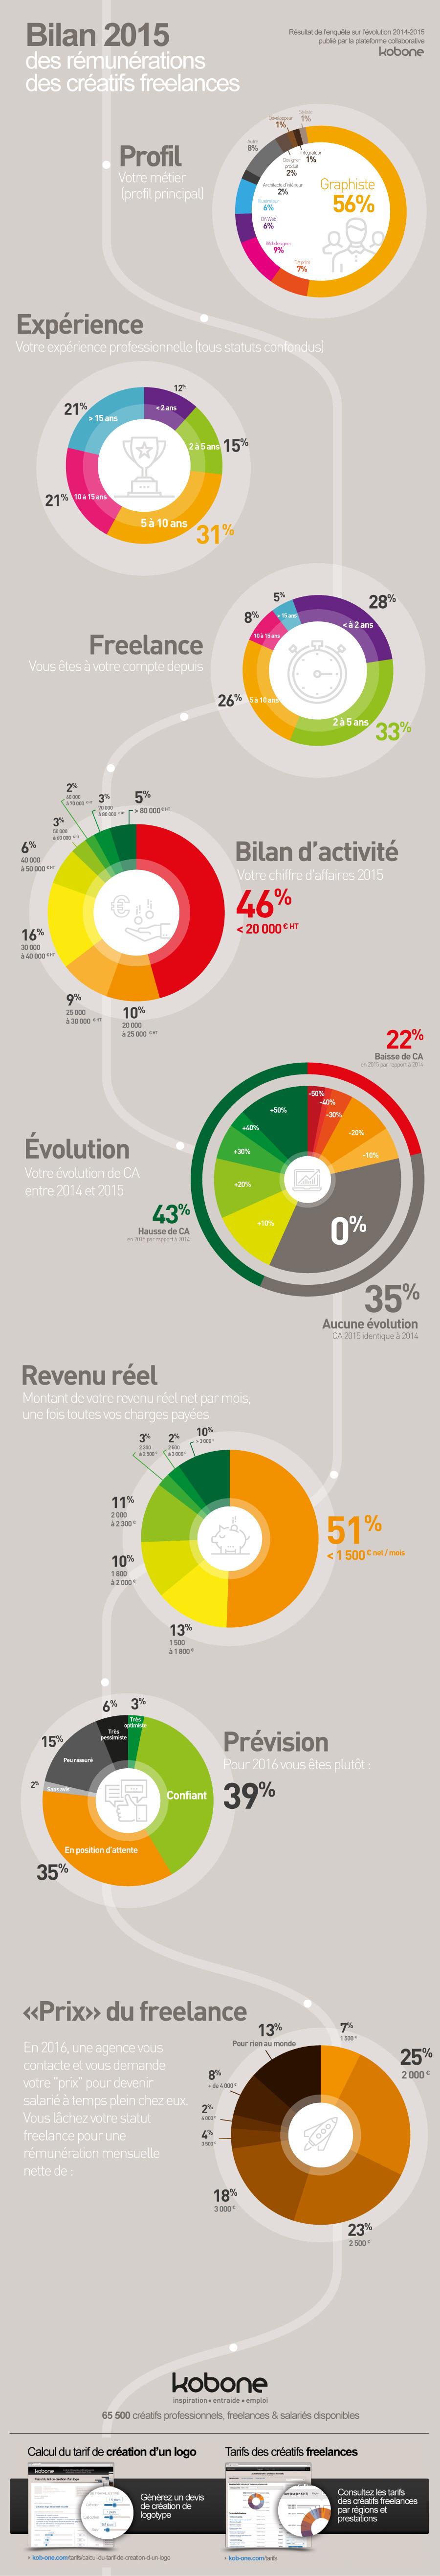 infographie bilan remuneration 2015 des creatifs freelances